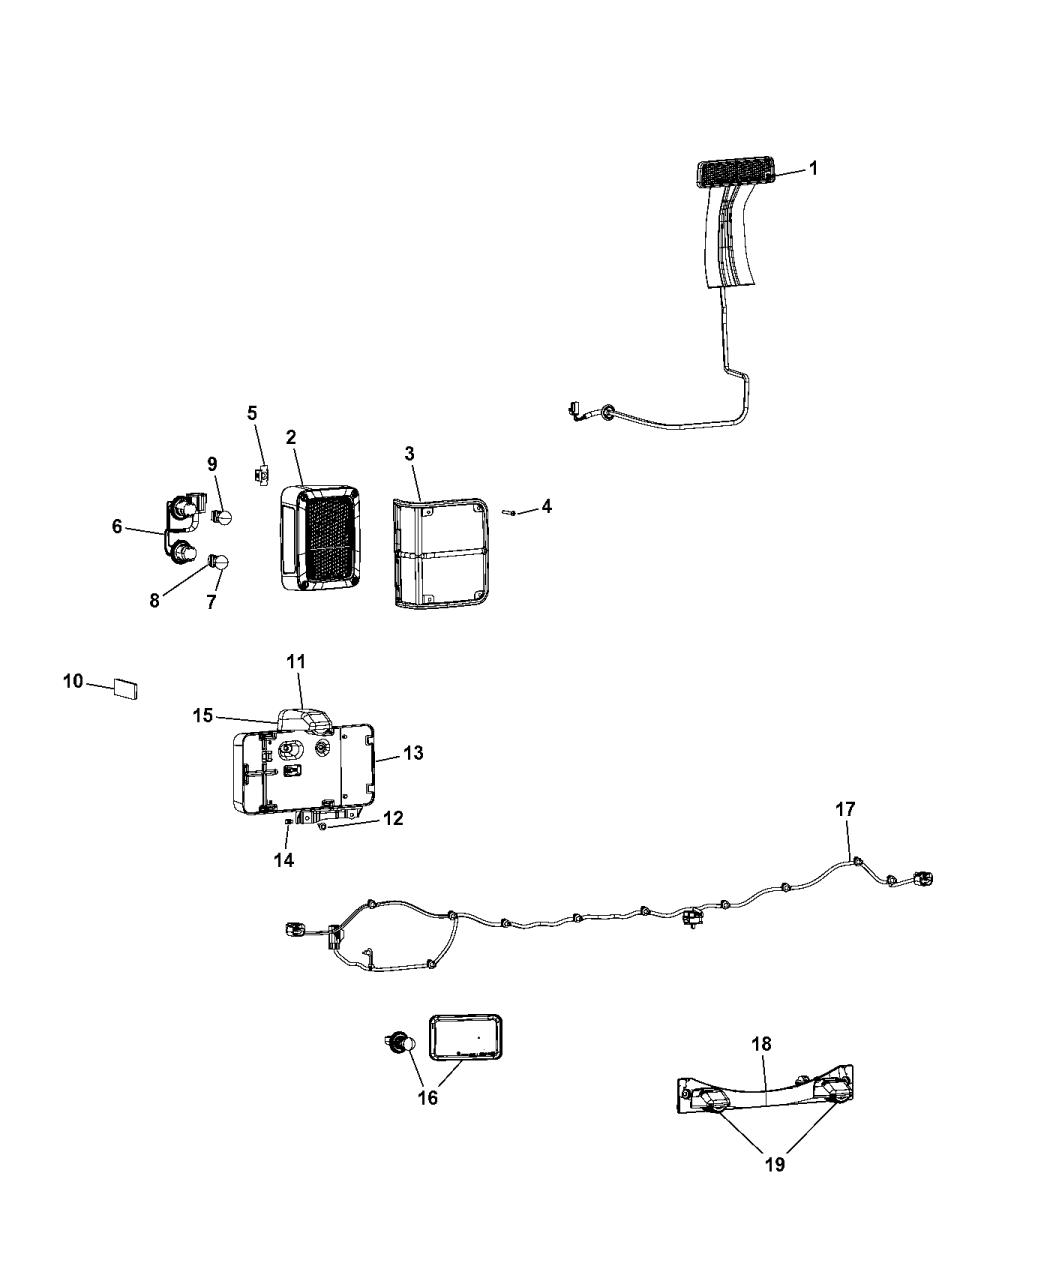 68004166ac